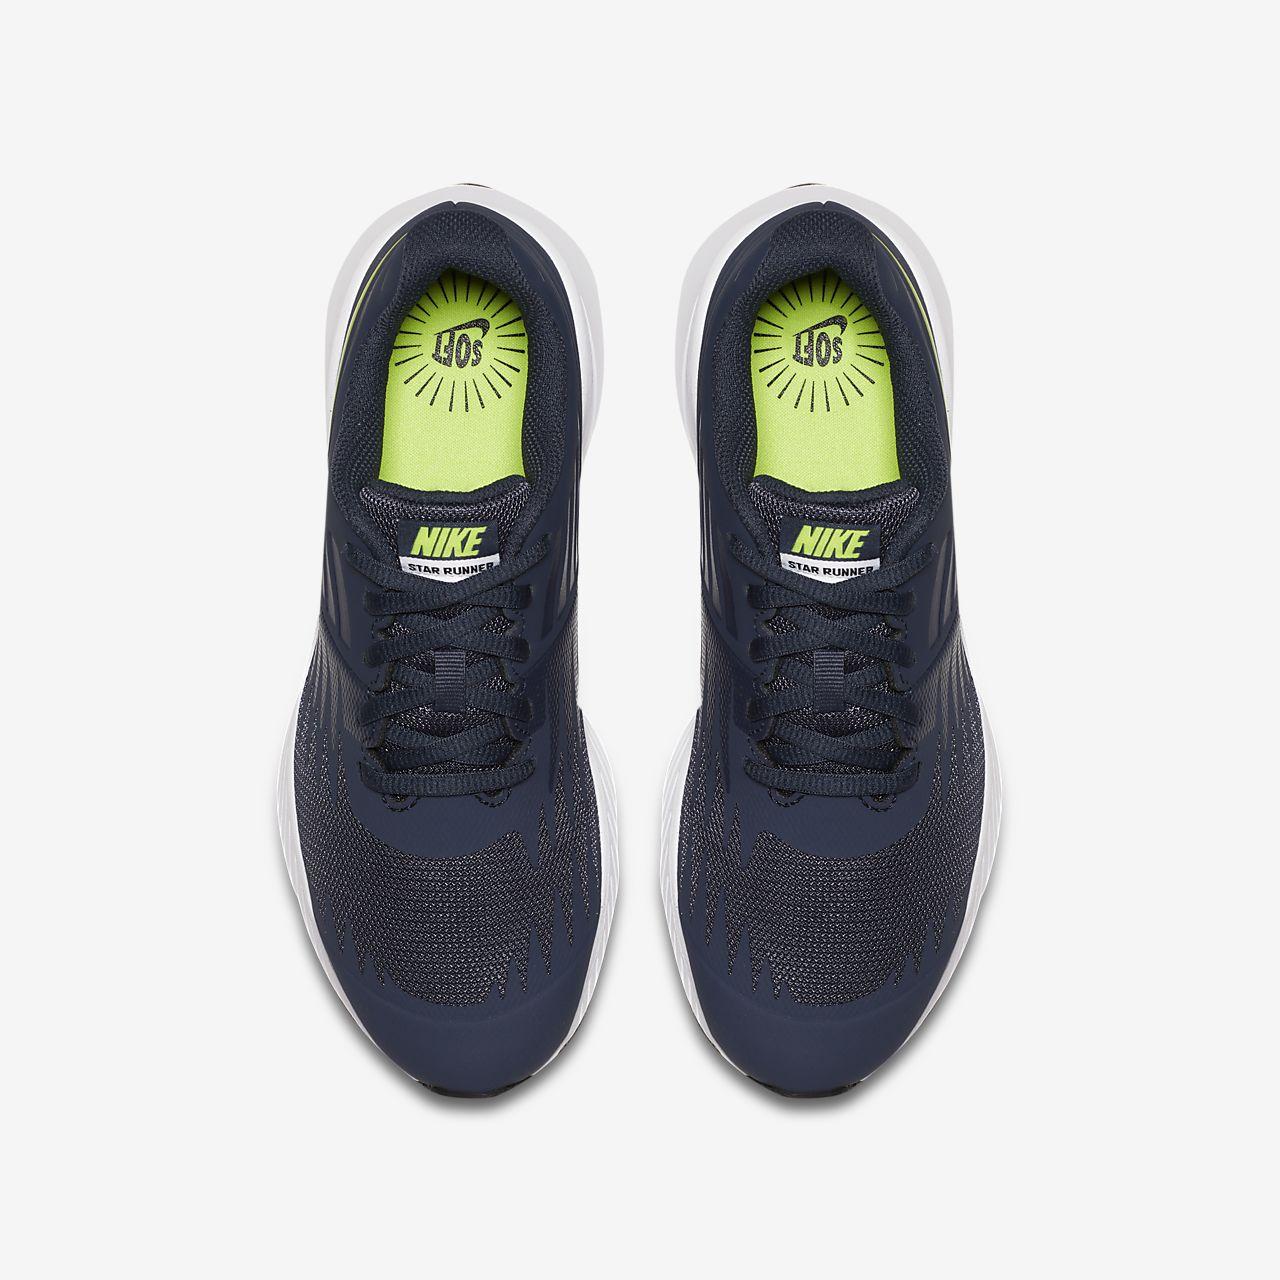 Nike Shoes Huntsville Al